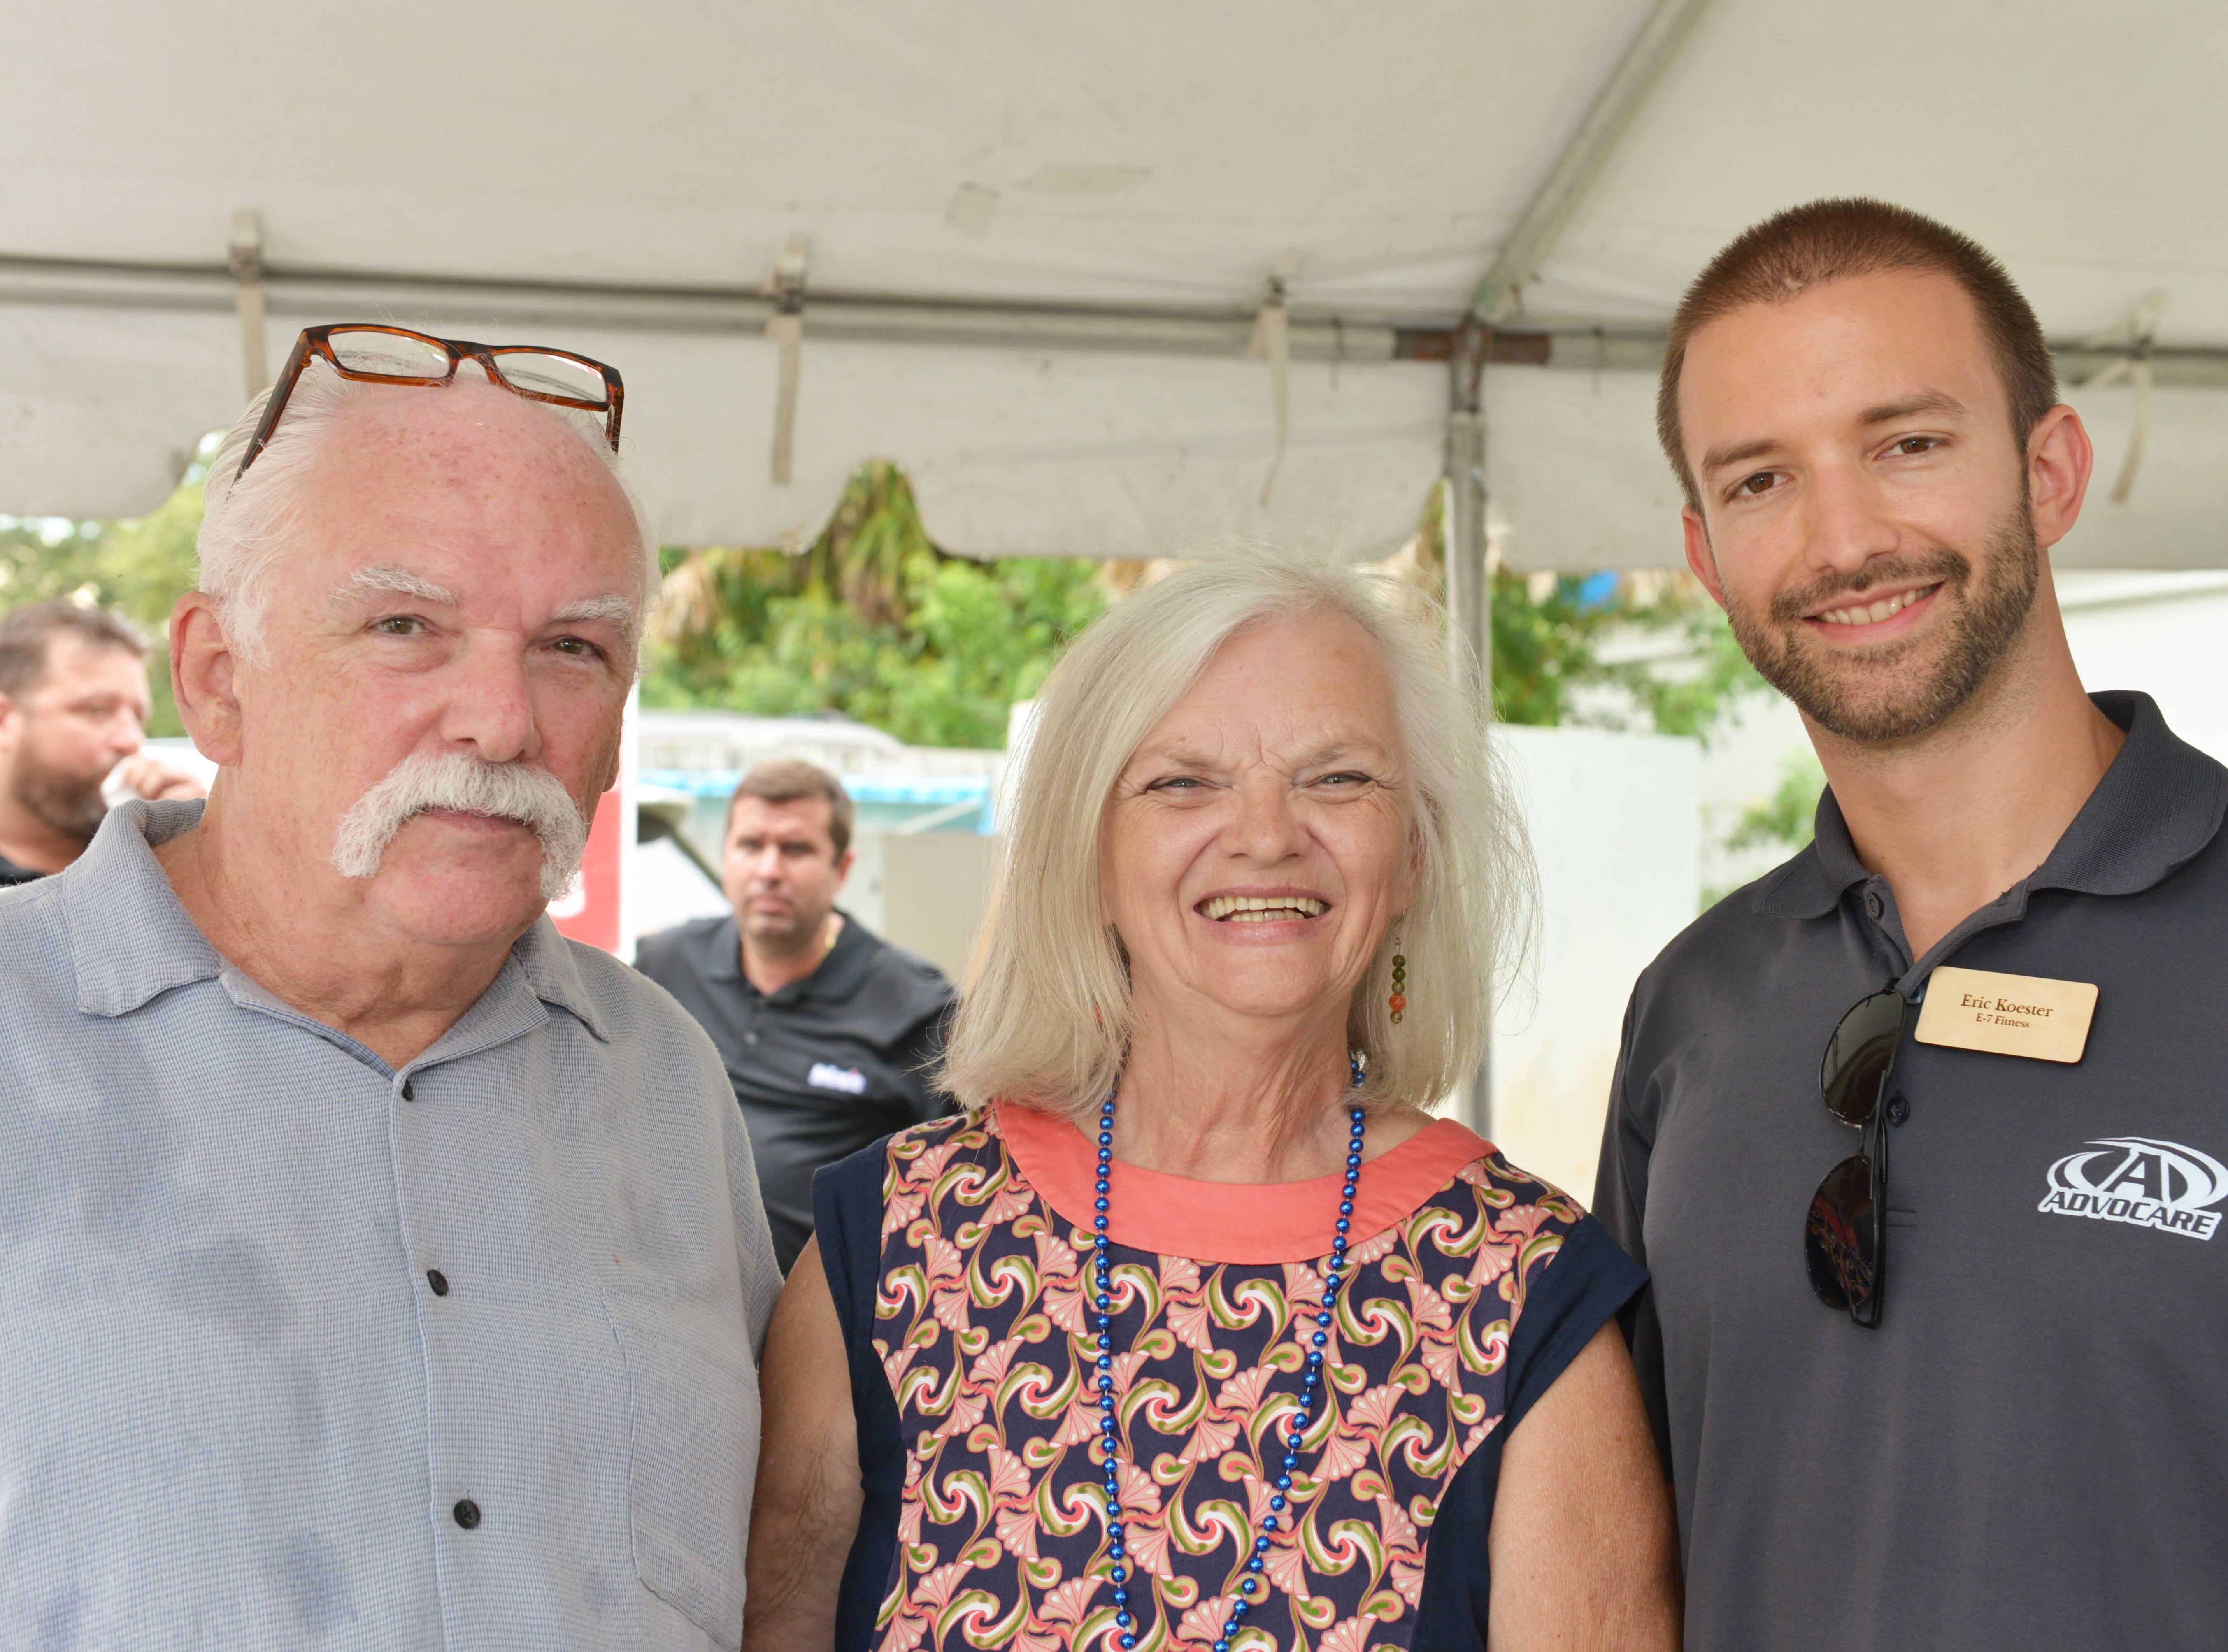 Jack Fiske, left, Deborah Fiske and Eric Koester at the Treasure Coast Builders Association's Fun After Five networking event.